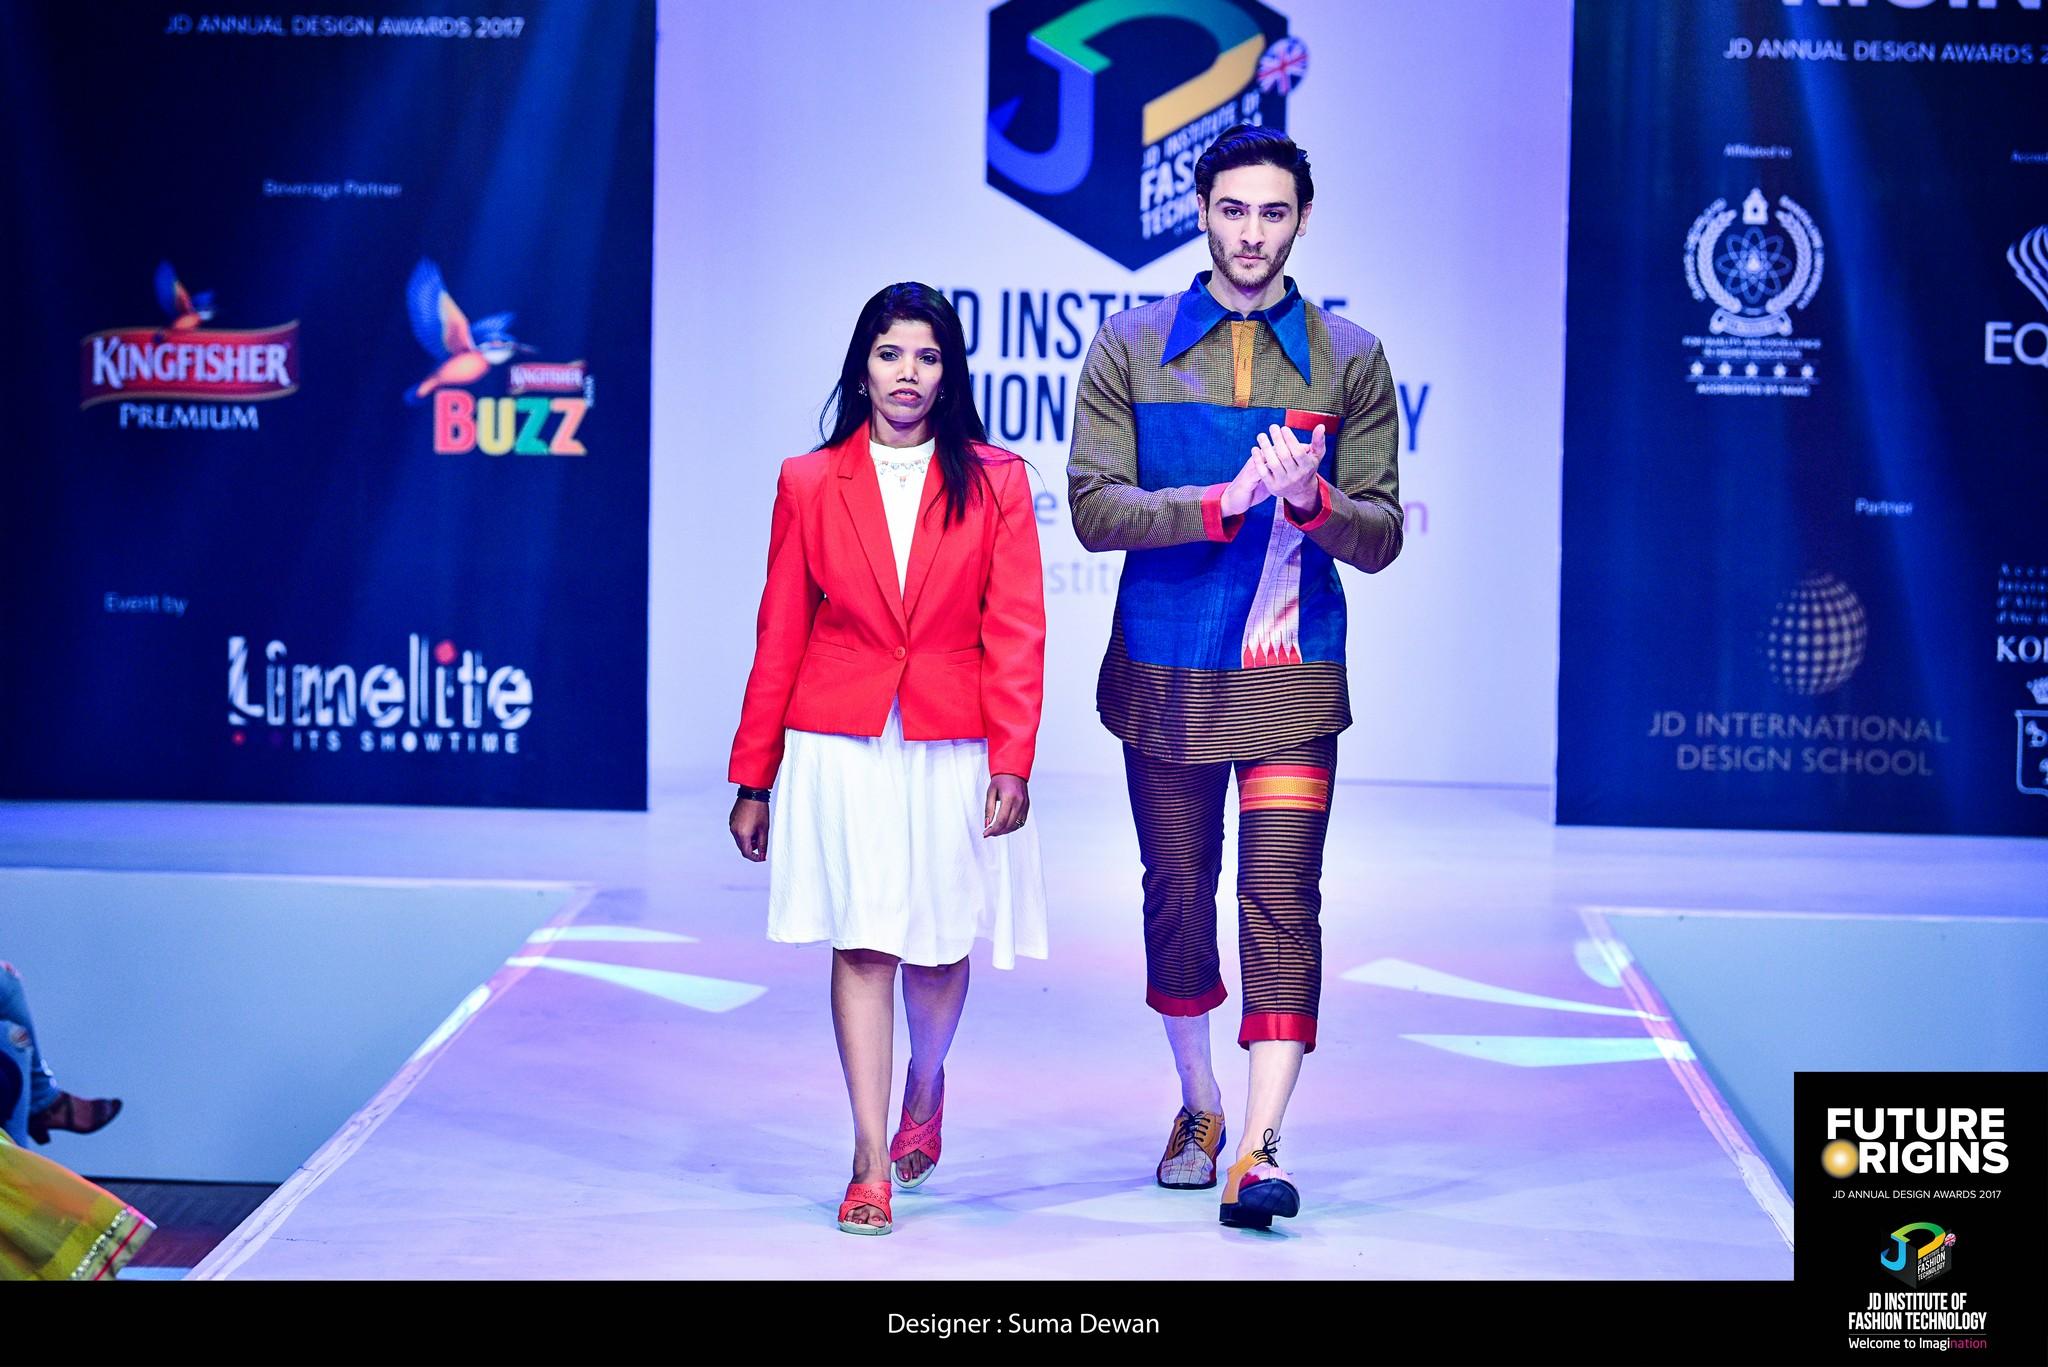 Ilkal - Future Origin - JD Annual Design Awards 2017 | Photography : Jerin Nath (@jerin_nath) ilkal - Ilkal Future Origin JD Annual Design Awards 2017 11 - Ilkal – Future Origin – JD Annual Design Awards 2017